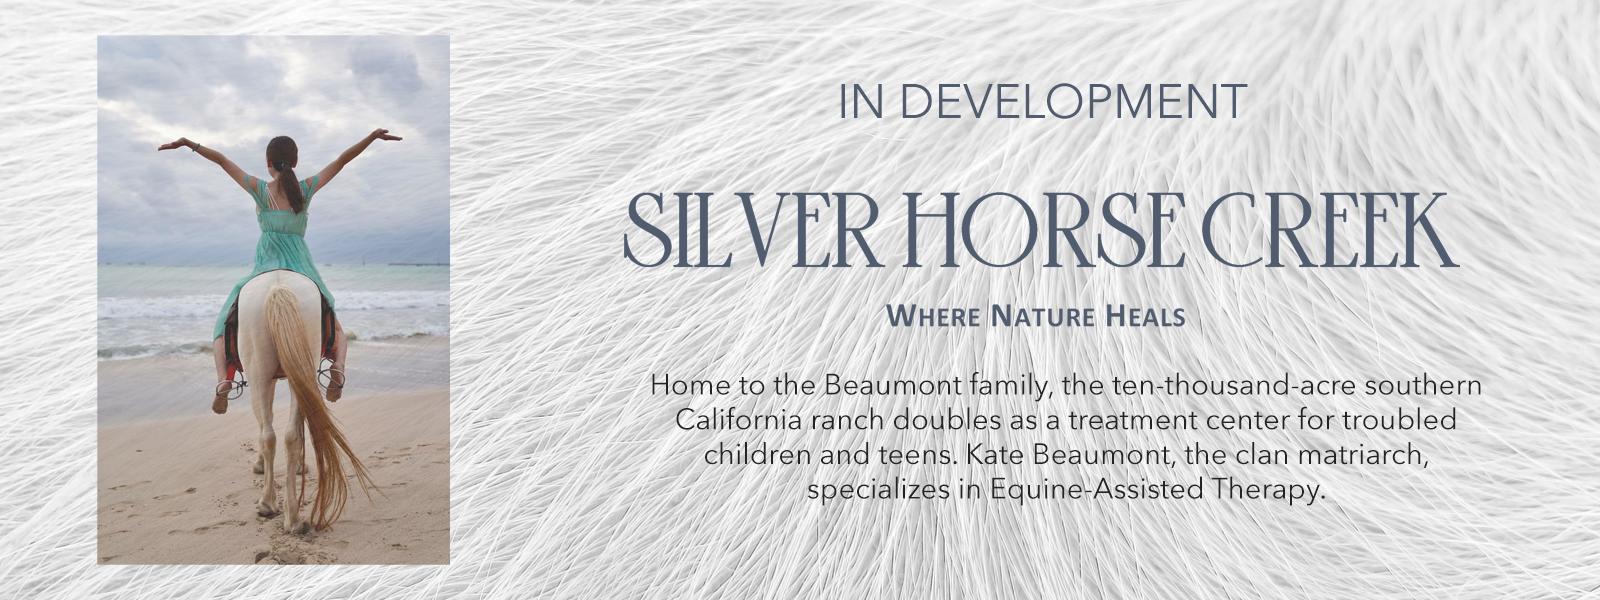 Silver Horse Creek